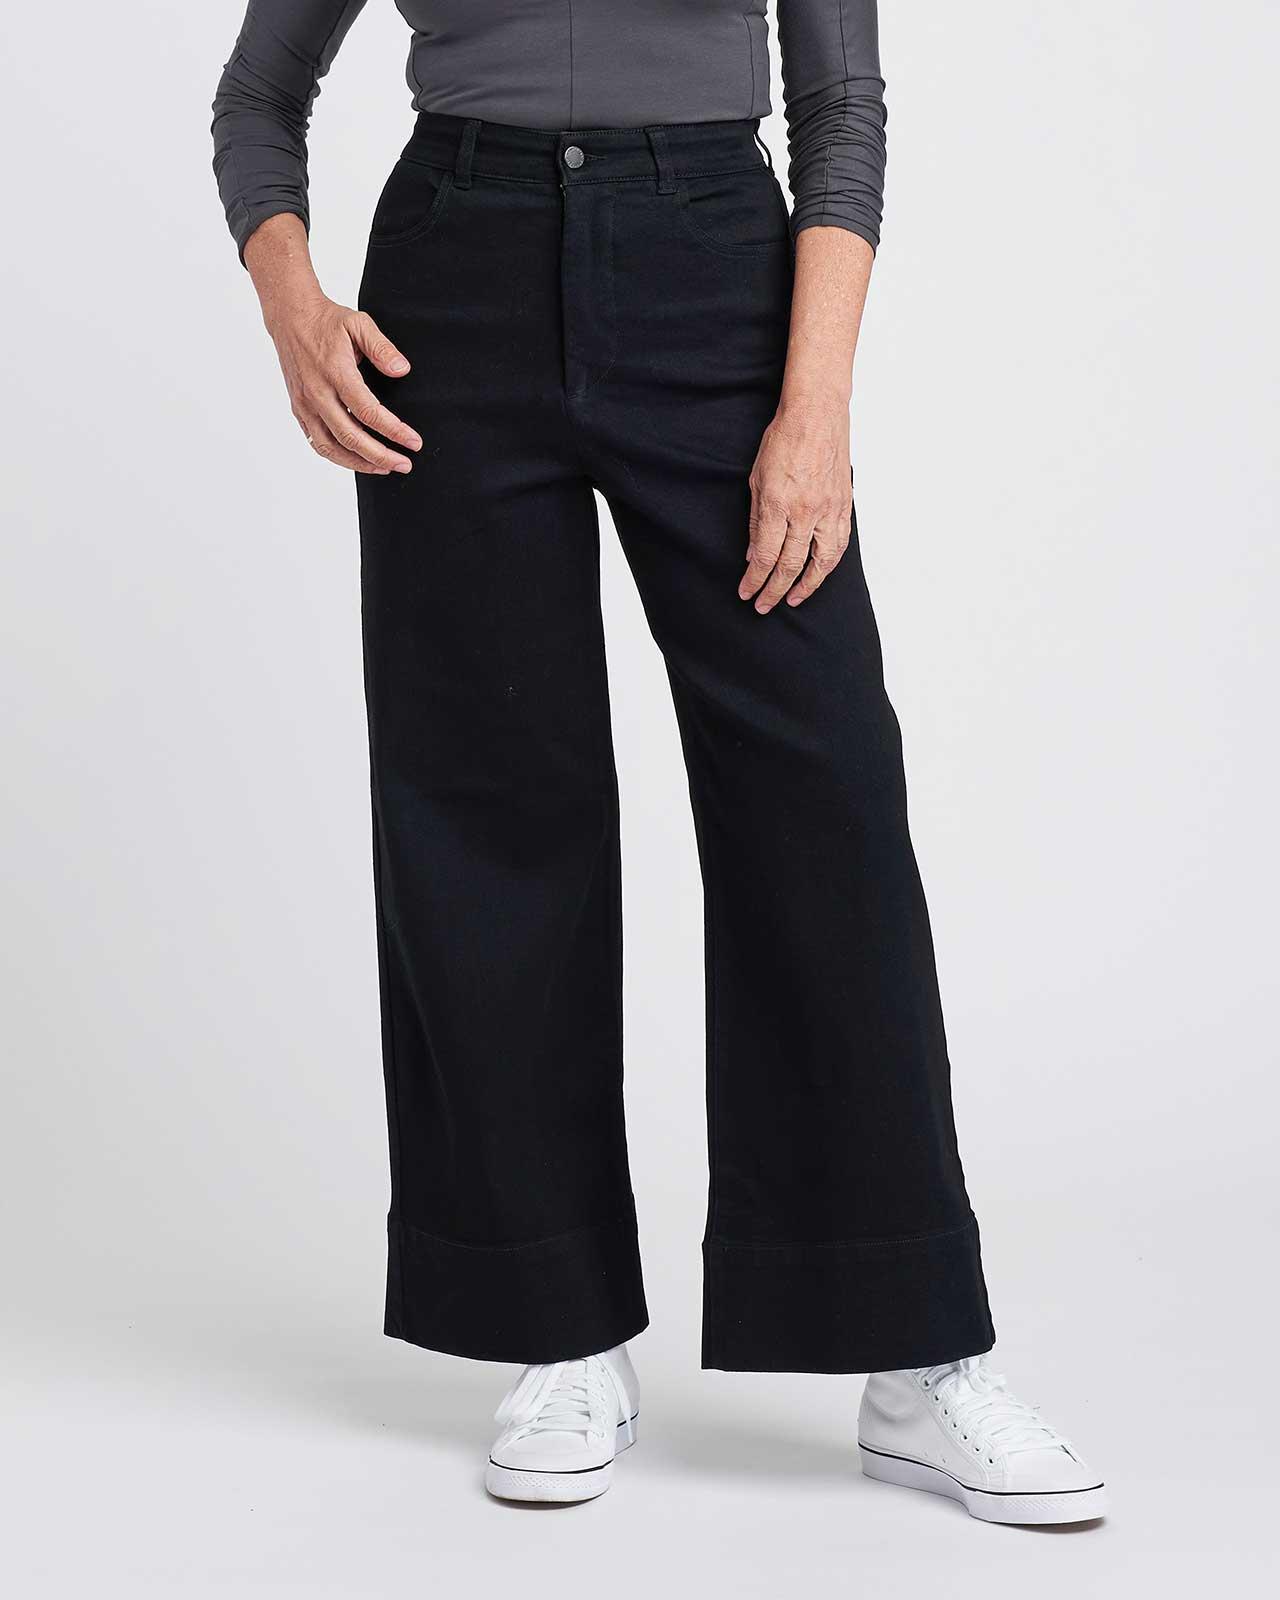 Best Baggy Jeans